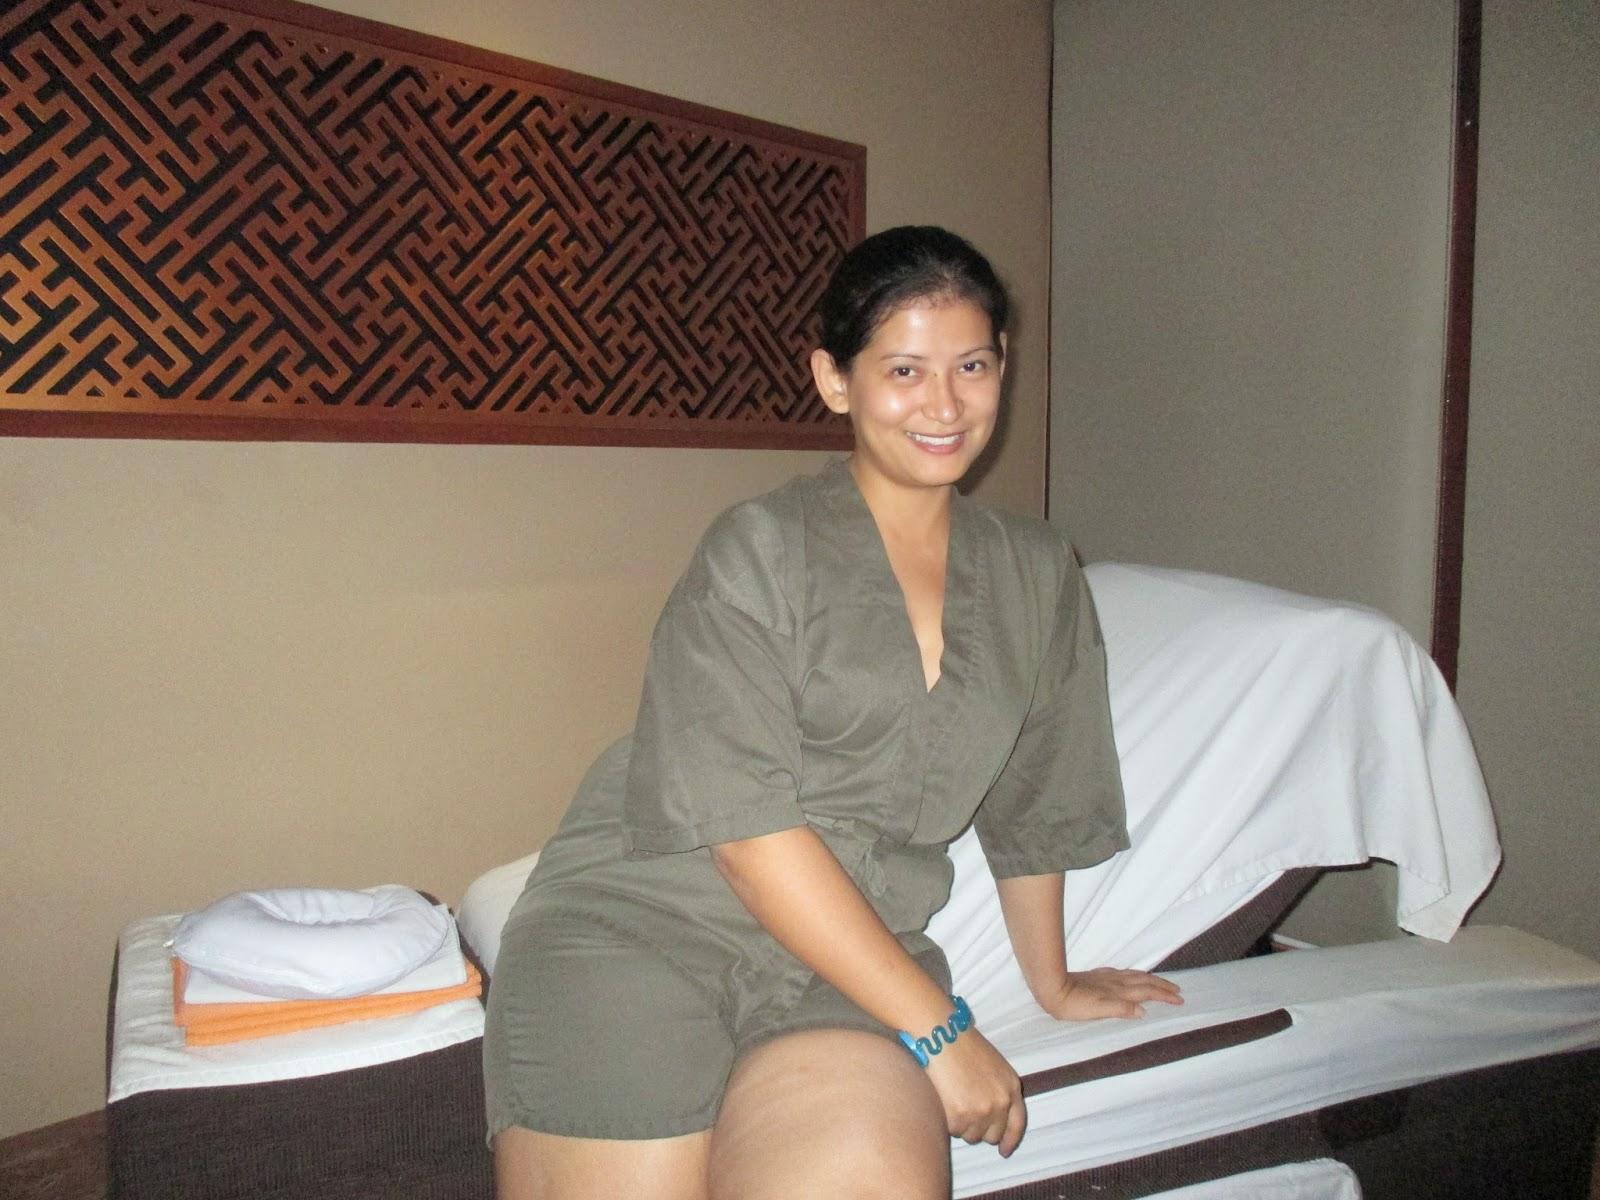 blackhair private nude massage